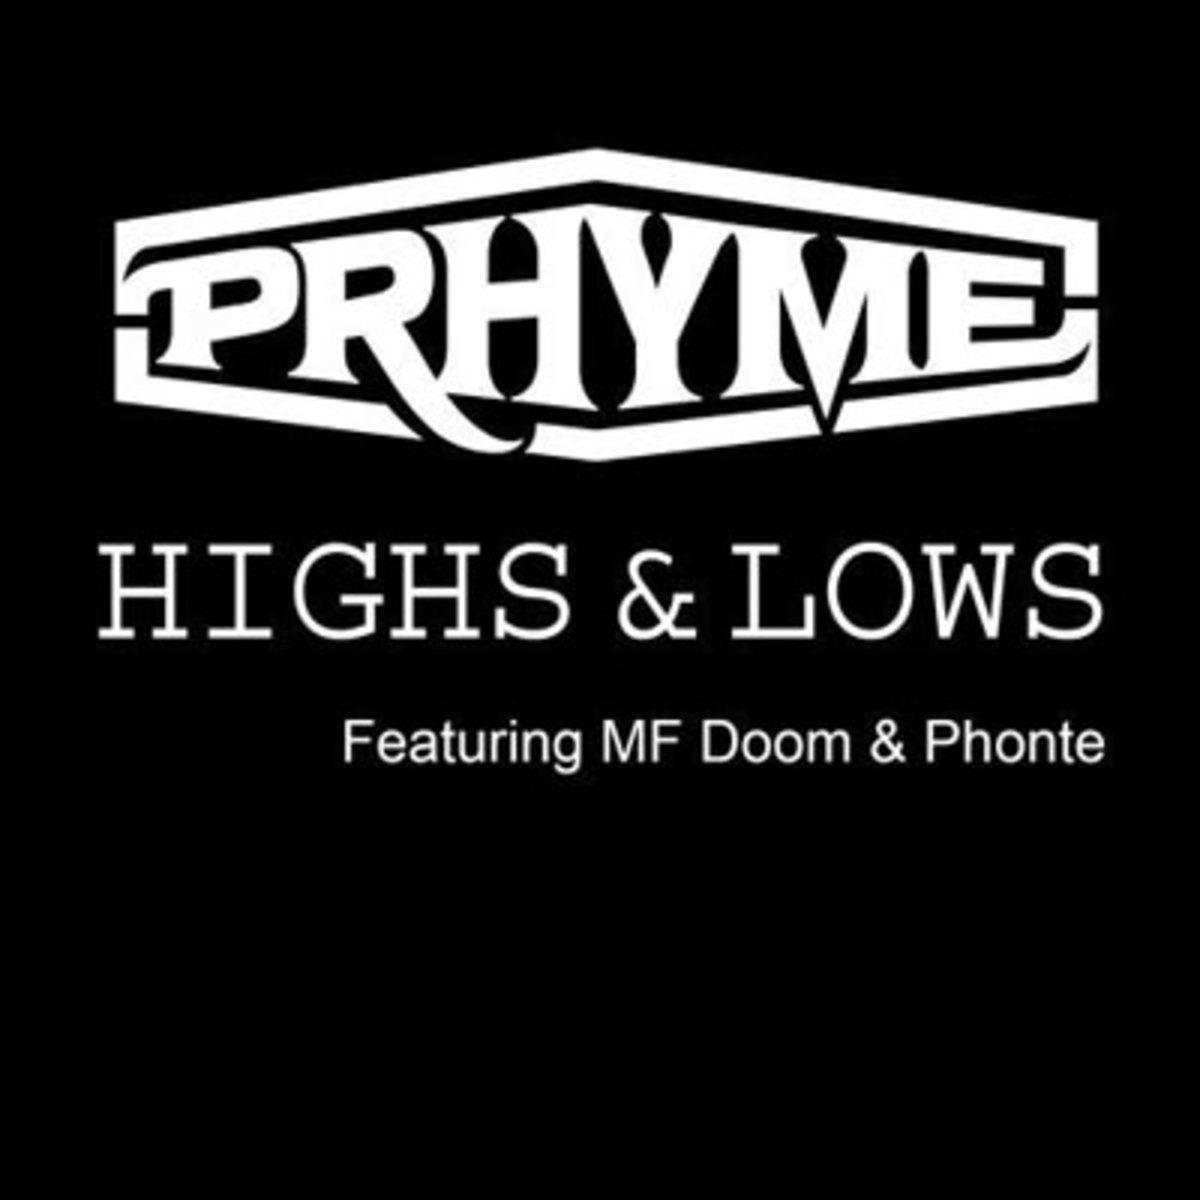 prhyme-highs-lows.jpg